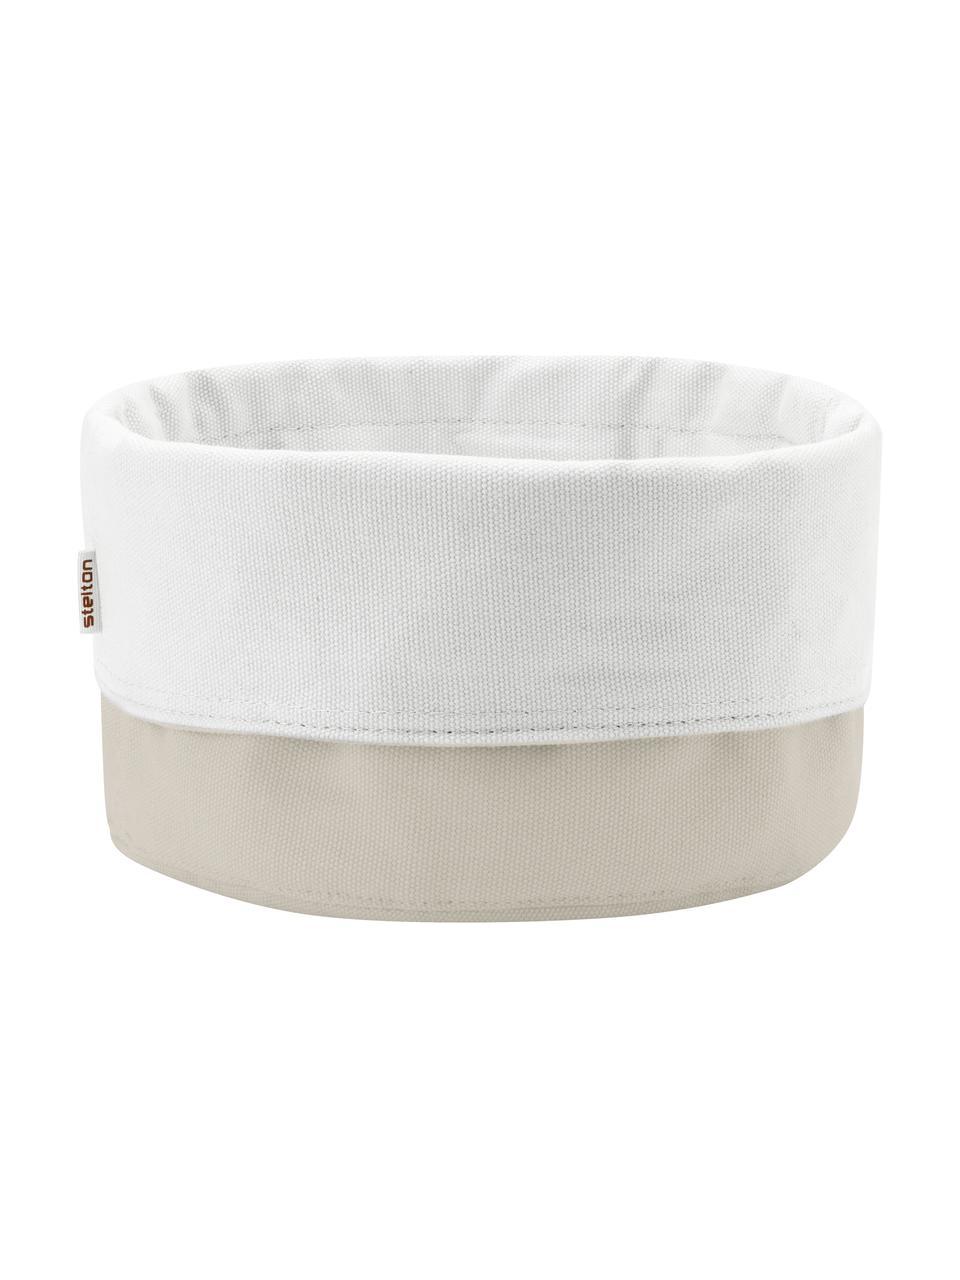 Cestino per pane in lino Oleg, 100% cotone lino, Color sabbia, bianco, Ø 23 x Alt. 21 cm